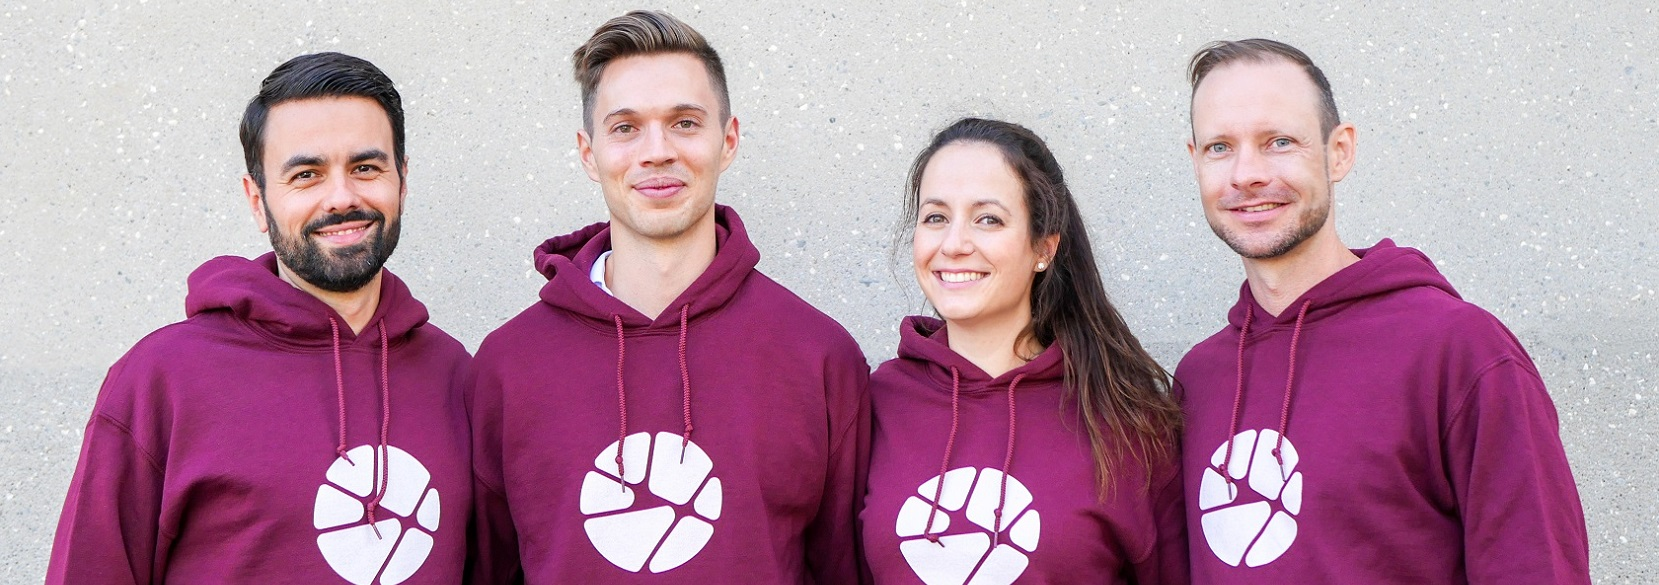 Startup-Winner: Sedimentum – Electrosuisse